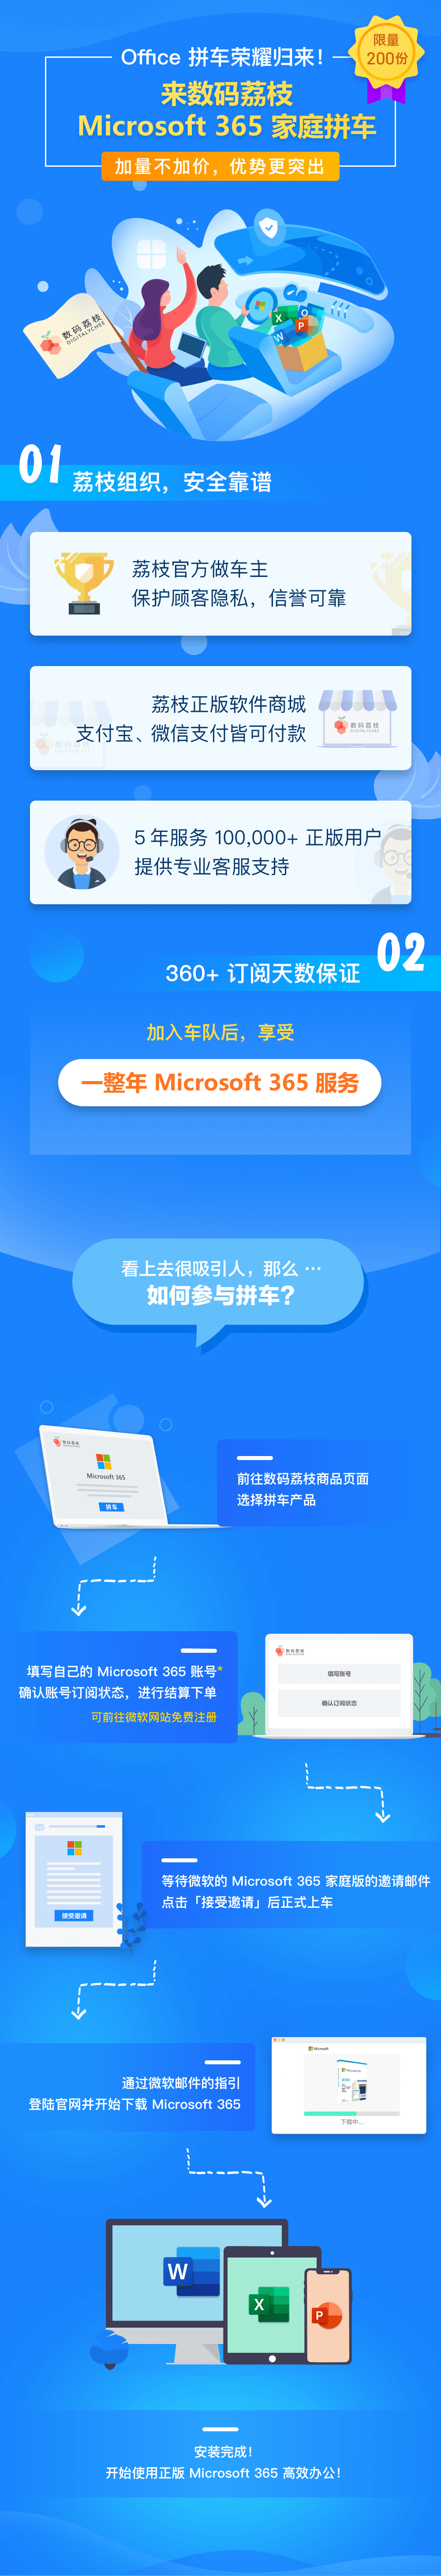 https://asset.droidyue.com/image/lizhi_io/office_365_21_03/image_2.png